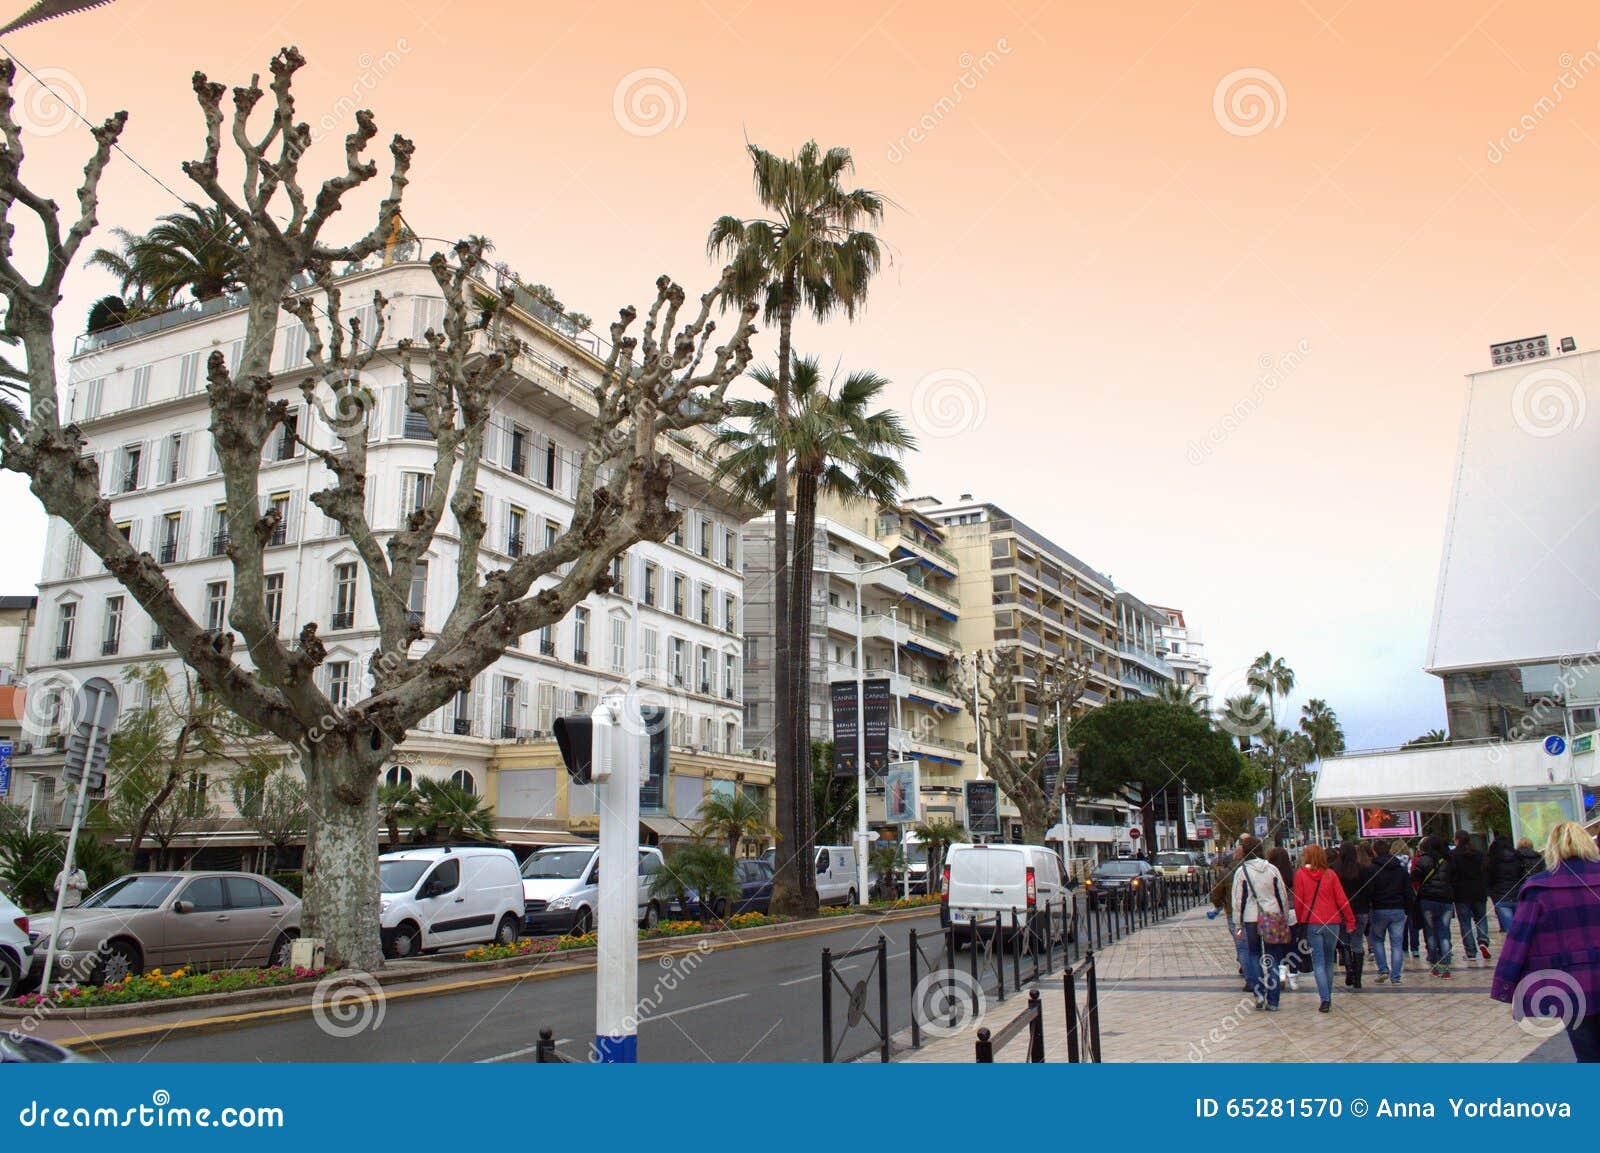 Promenade De La PantieroCannes Editorial Image Image of street